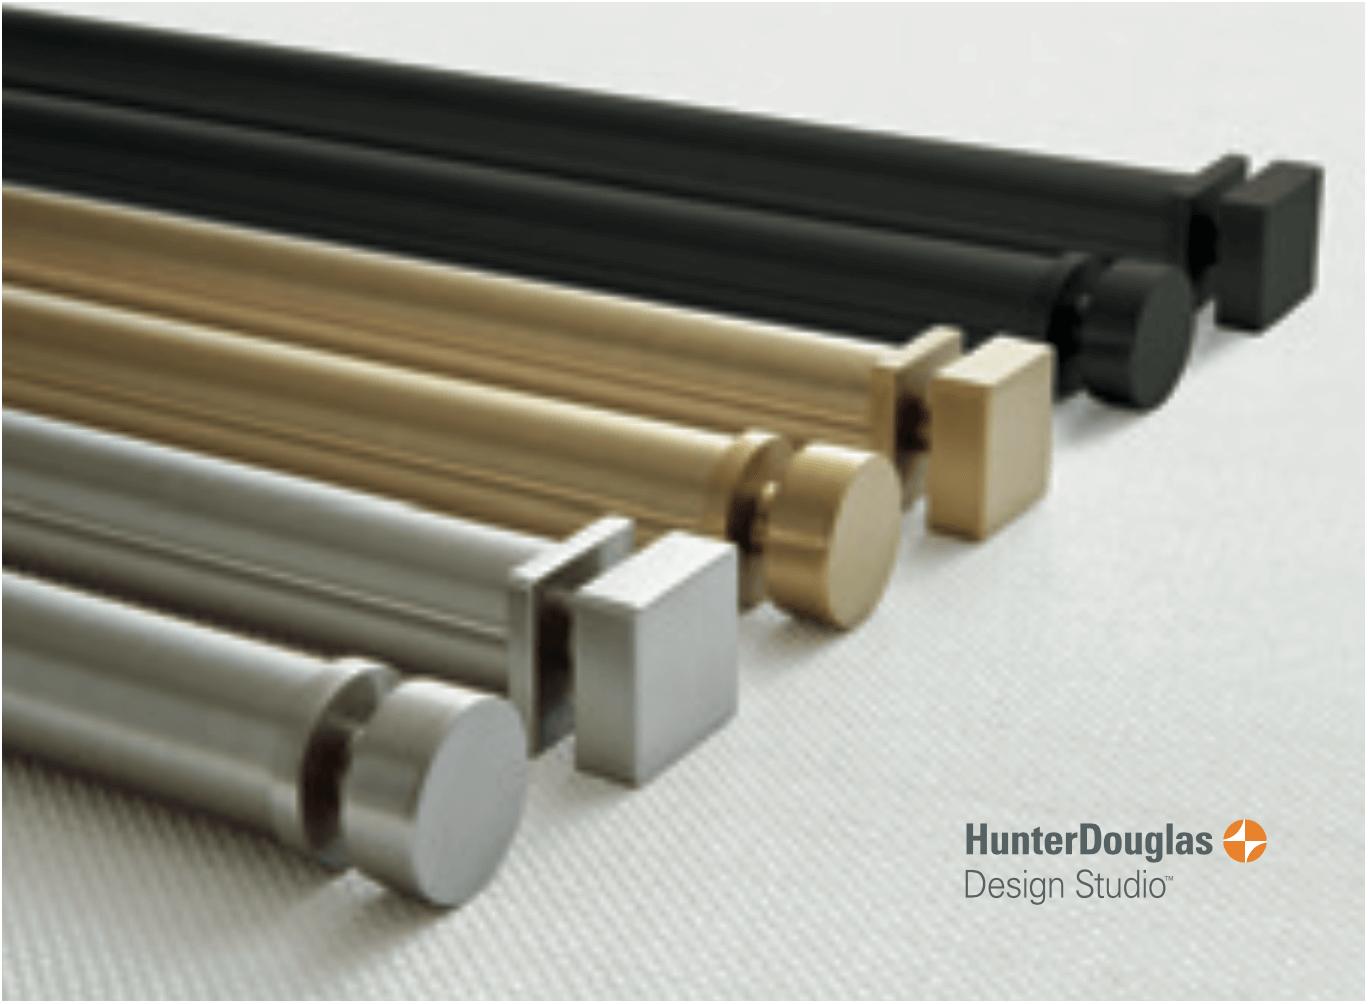 Design Studio Decorative Hardware